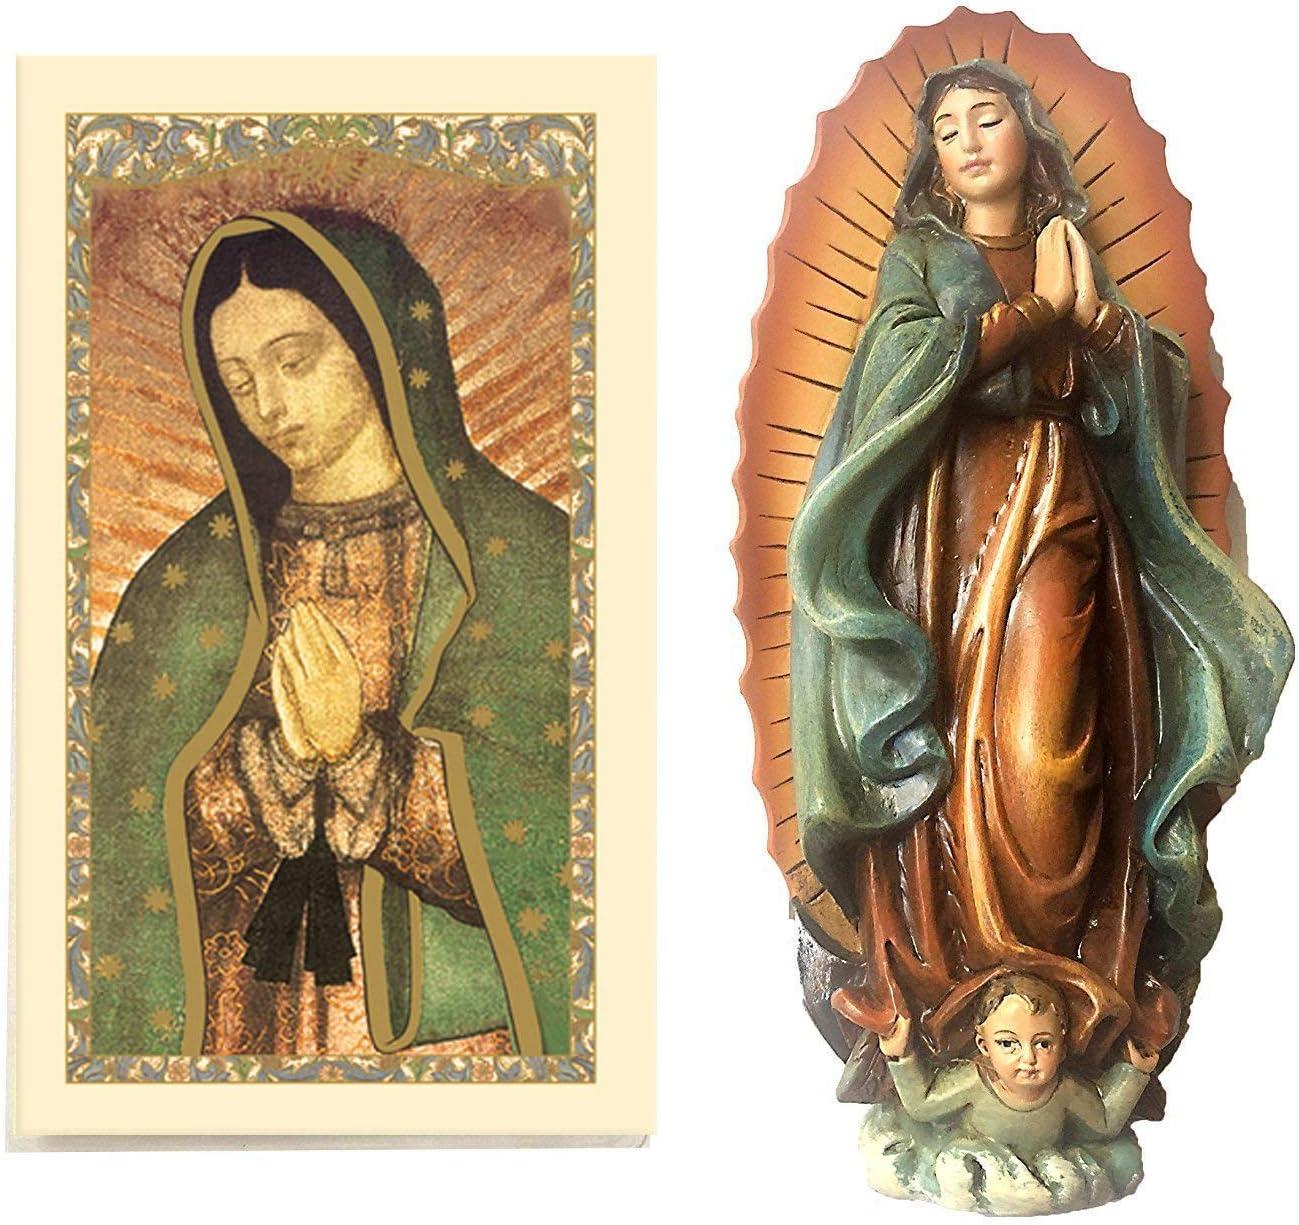 "Elysian Gift Shop 4"" Our Lady of Guadalupe Virgin Mary Statue with Laminated Prayer Card Included/Estatuilla de la Vigen de Guadalupe (4"" H) - Incluye Trajeta de Oracion"